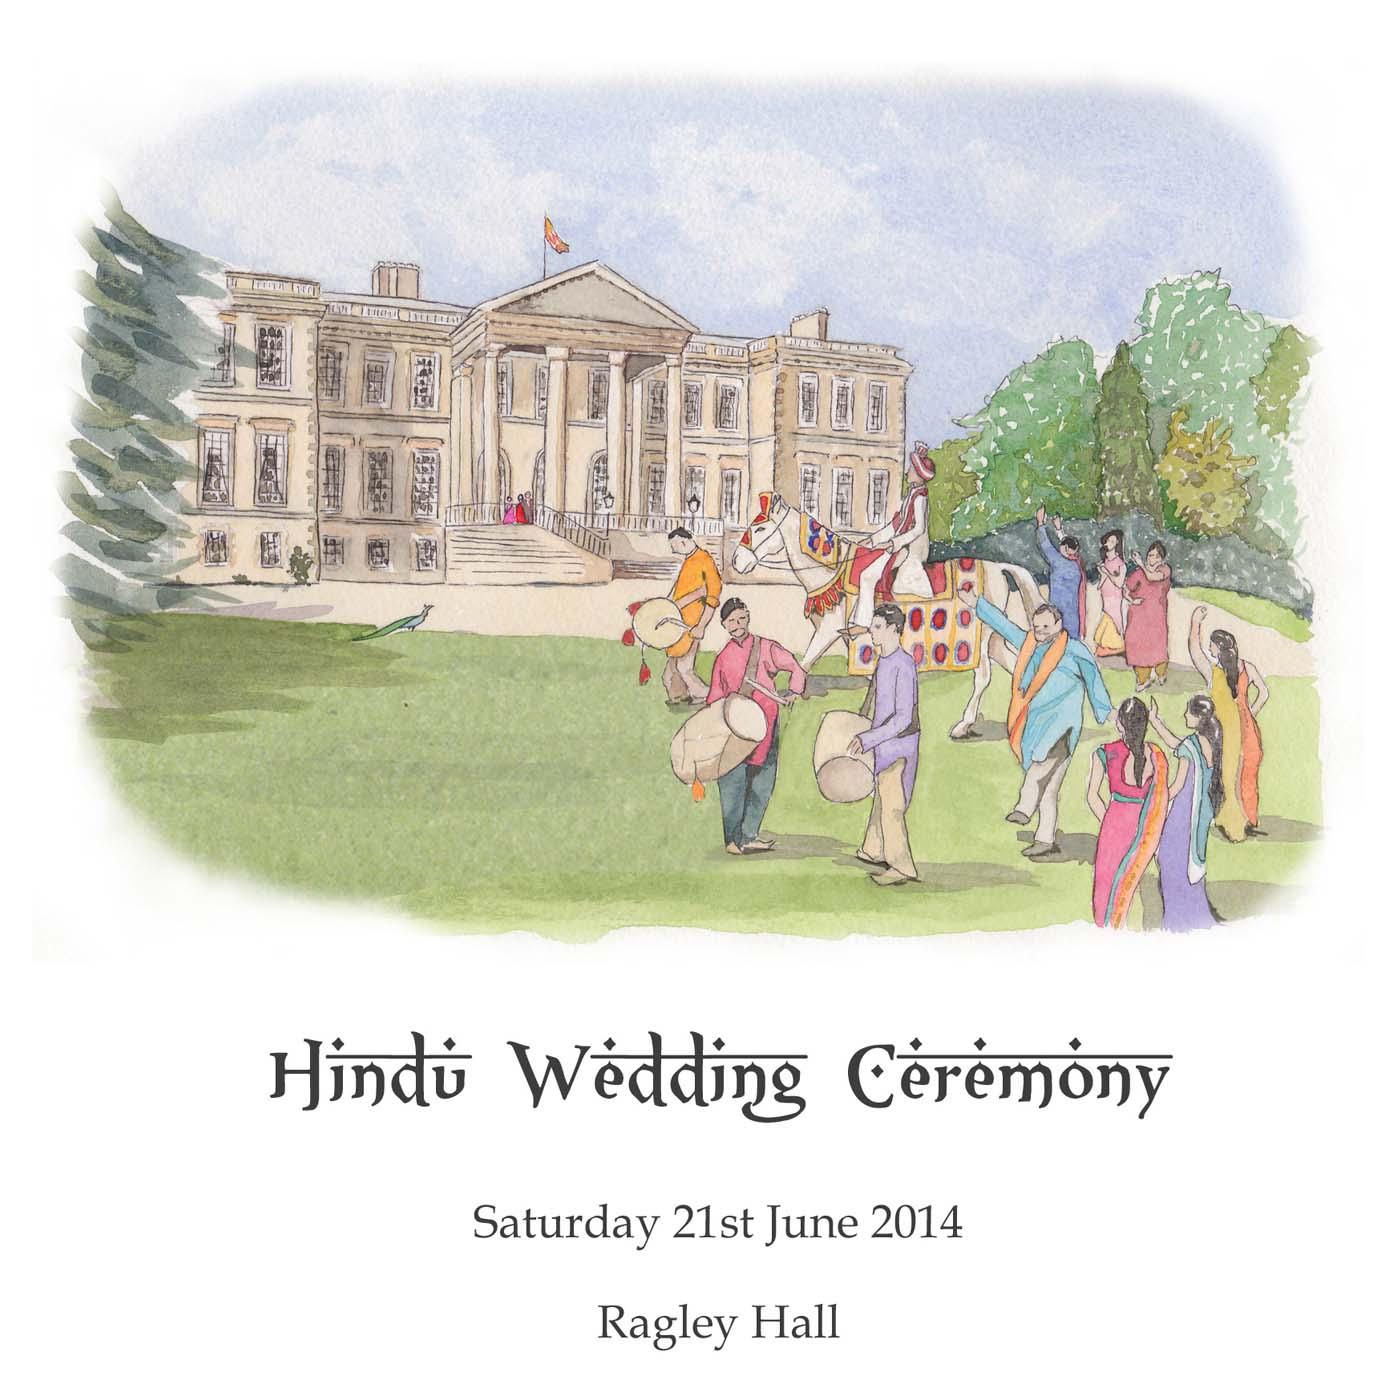 Ragley Hall Residence Modern Dwellings Cablik Enterprises: Bespoke Hand Painted Wedding Invitations, Bespoke Wedding